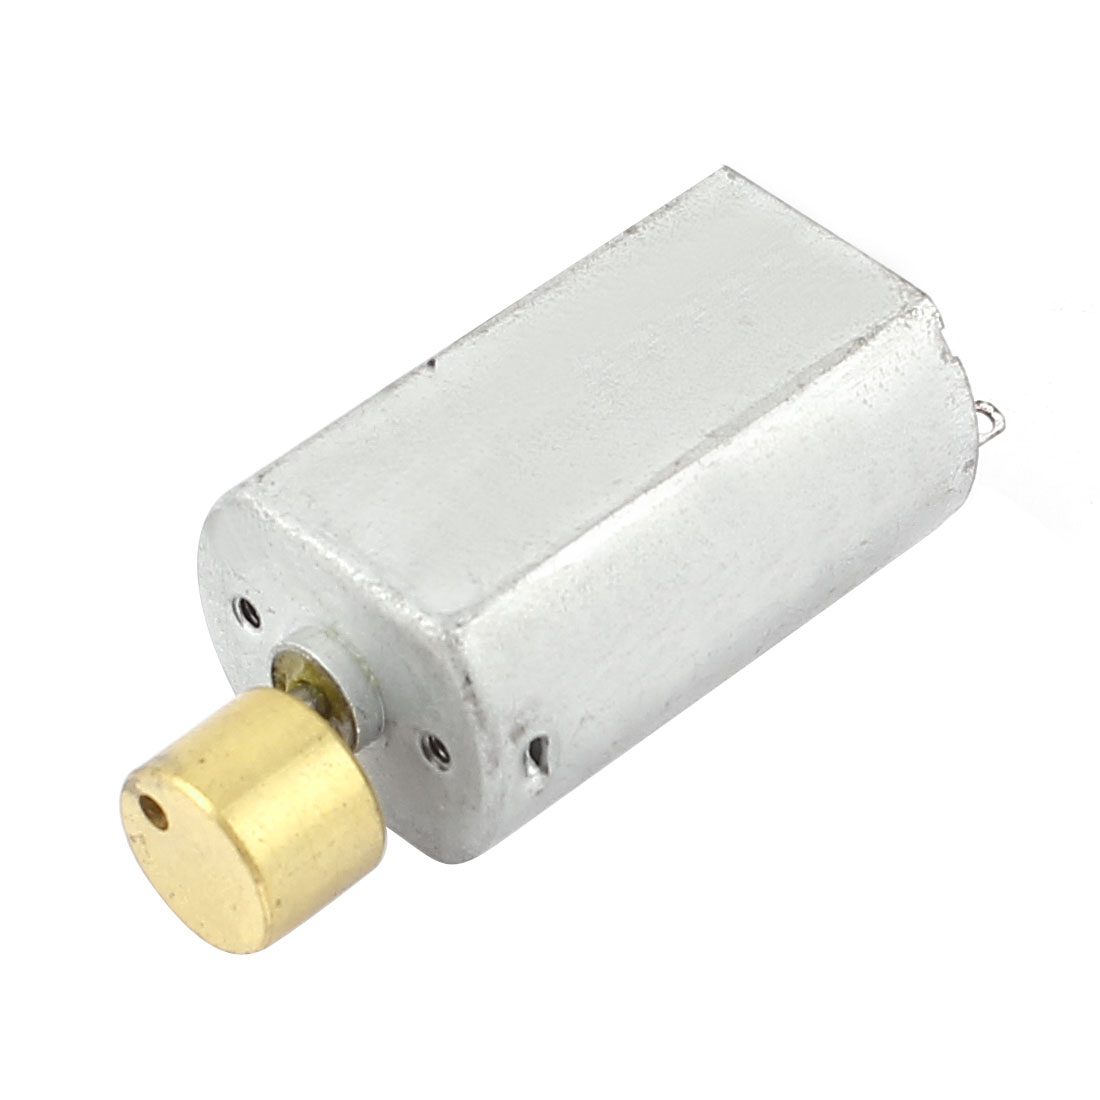 3V 7300RPM 2mm Shaft Dia High Torque Magnet DC Motor for DIY Toys Project